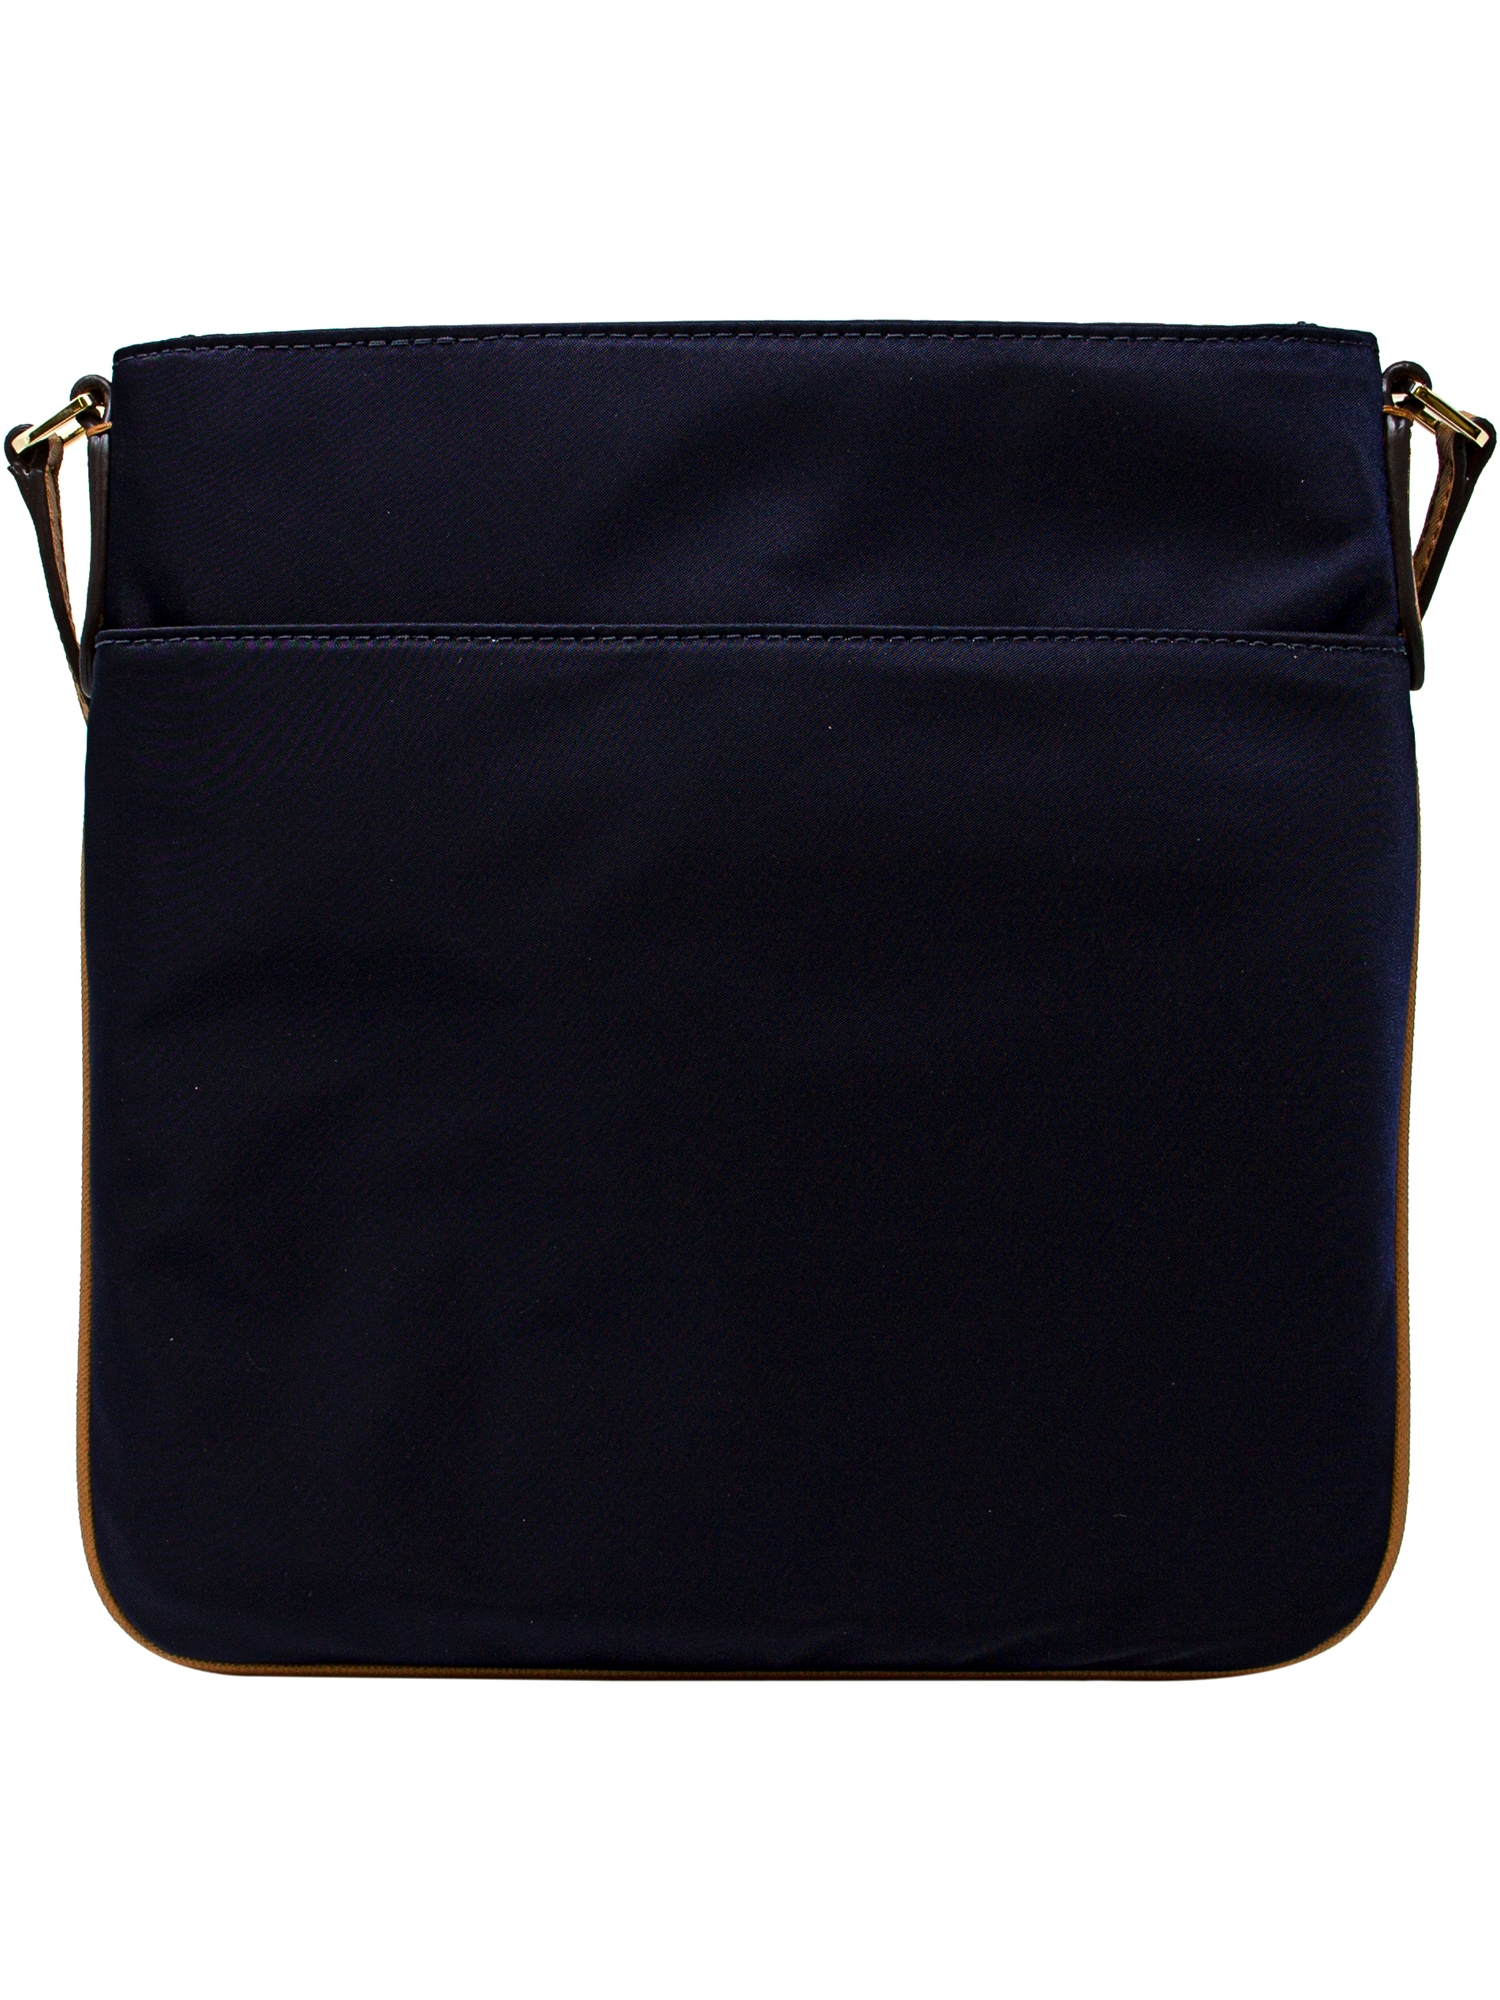 20cb85d9ac9c Michael Kors - Women's Large Kelsey Nylon Crossbody Cross Body Bag - Admiral  - Walmart.com